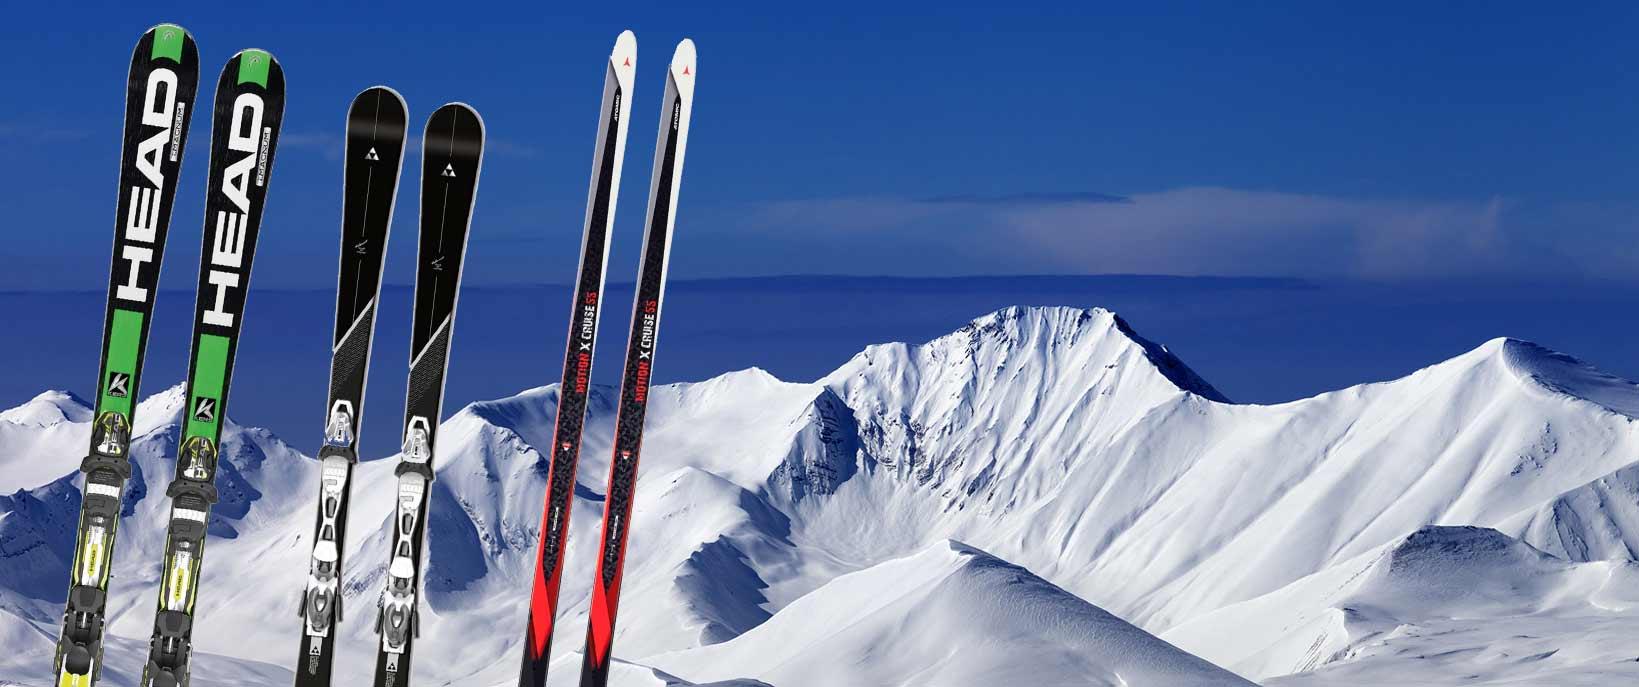 ski trends 2015/16